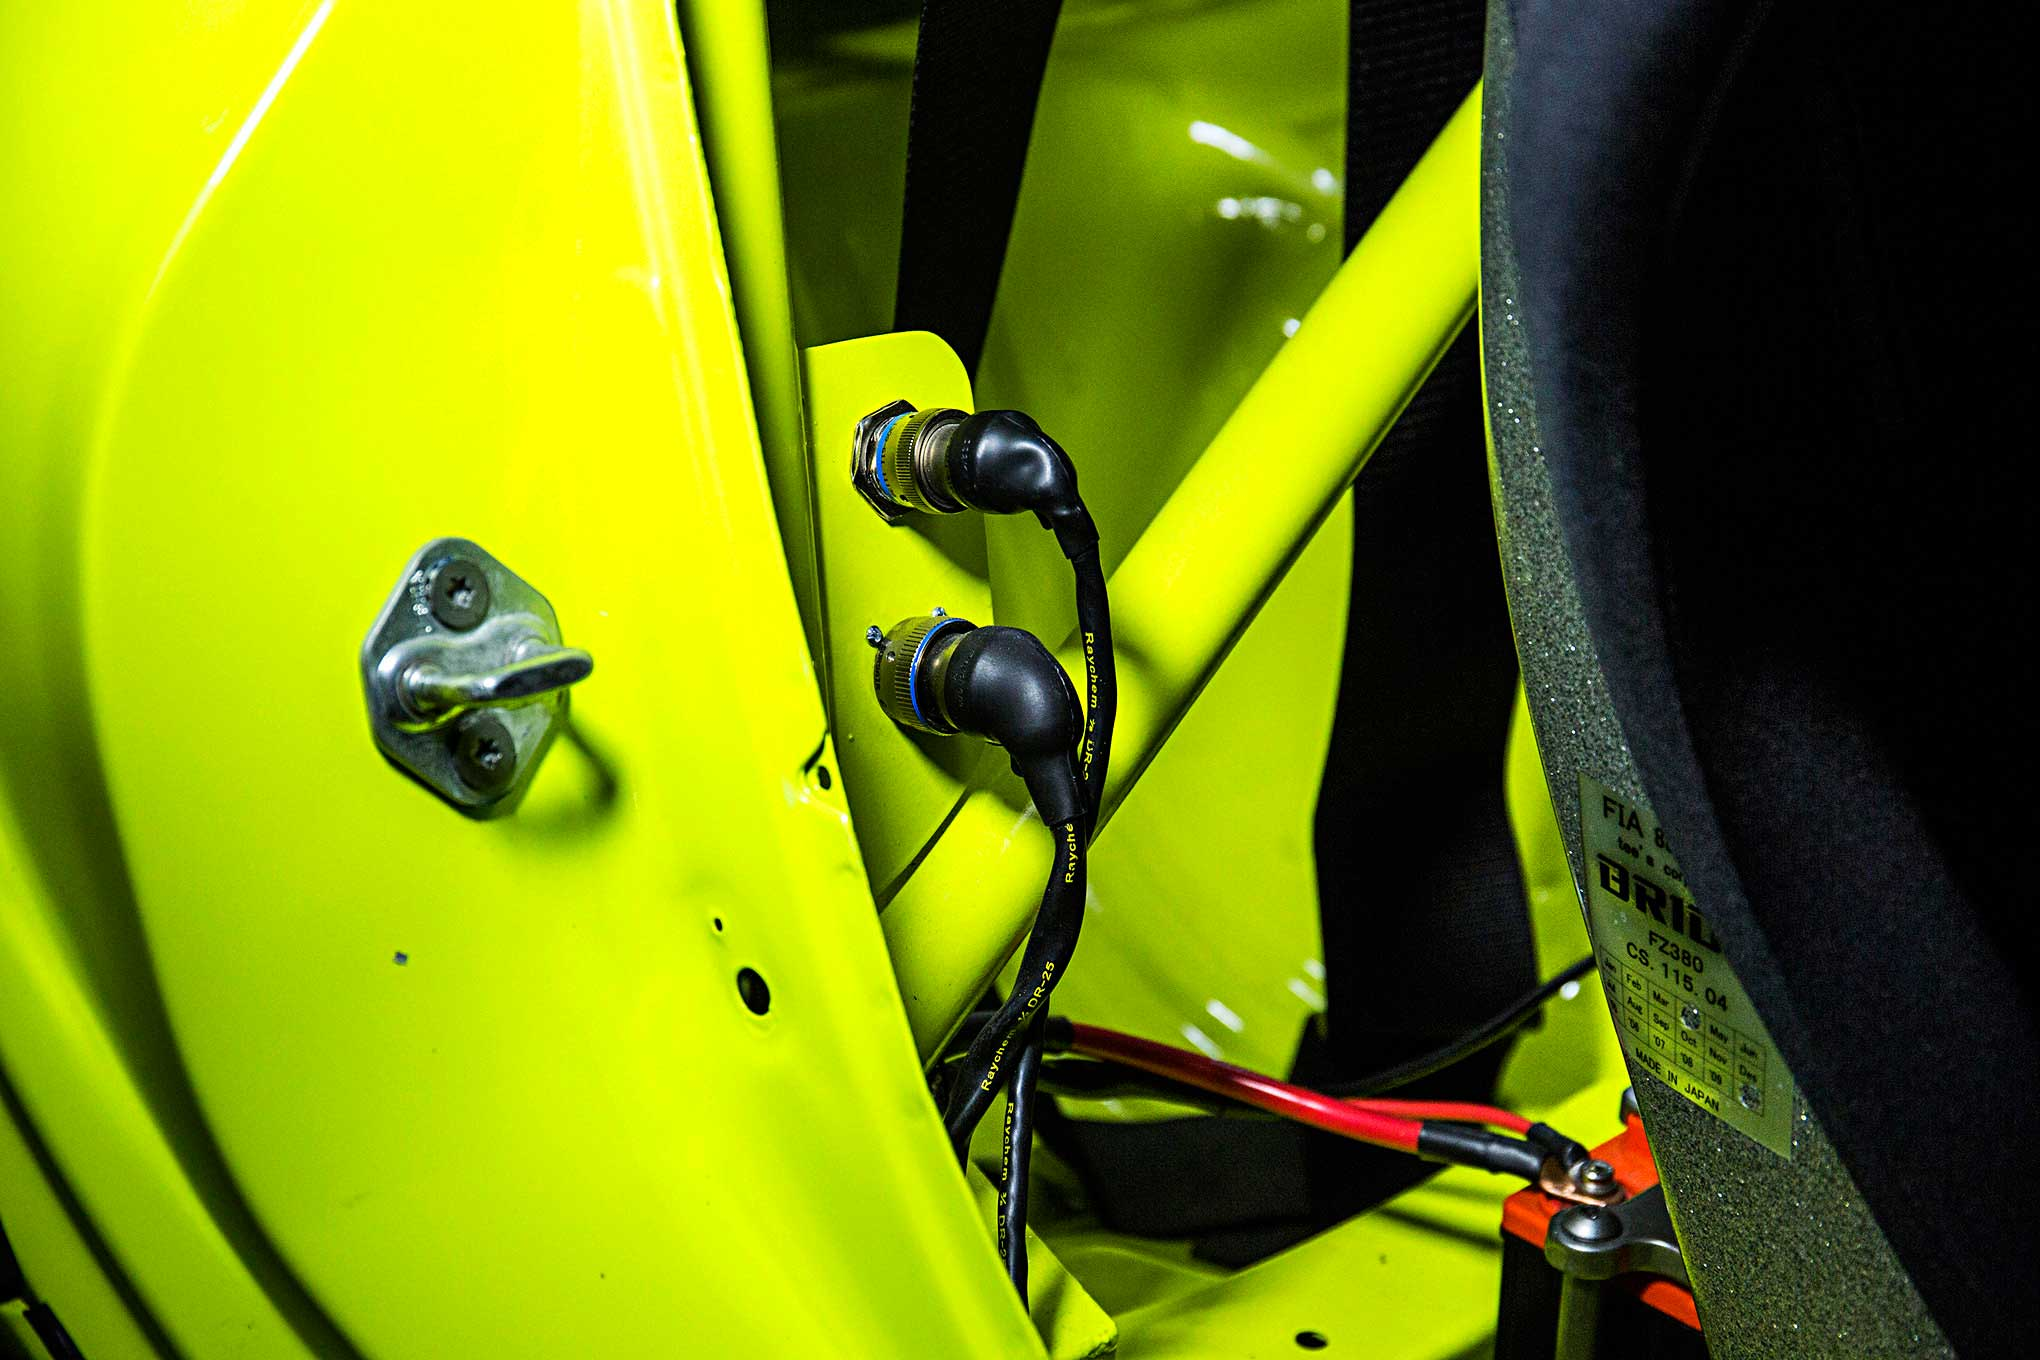 hight resolution of 1993 mazda rx 7 shine bright1993 mazda rx 7 custom rywire wiring harness